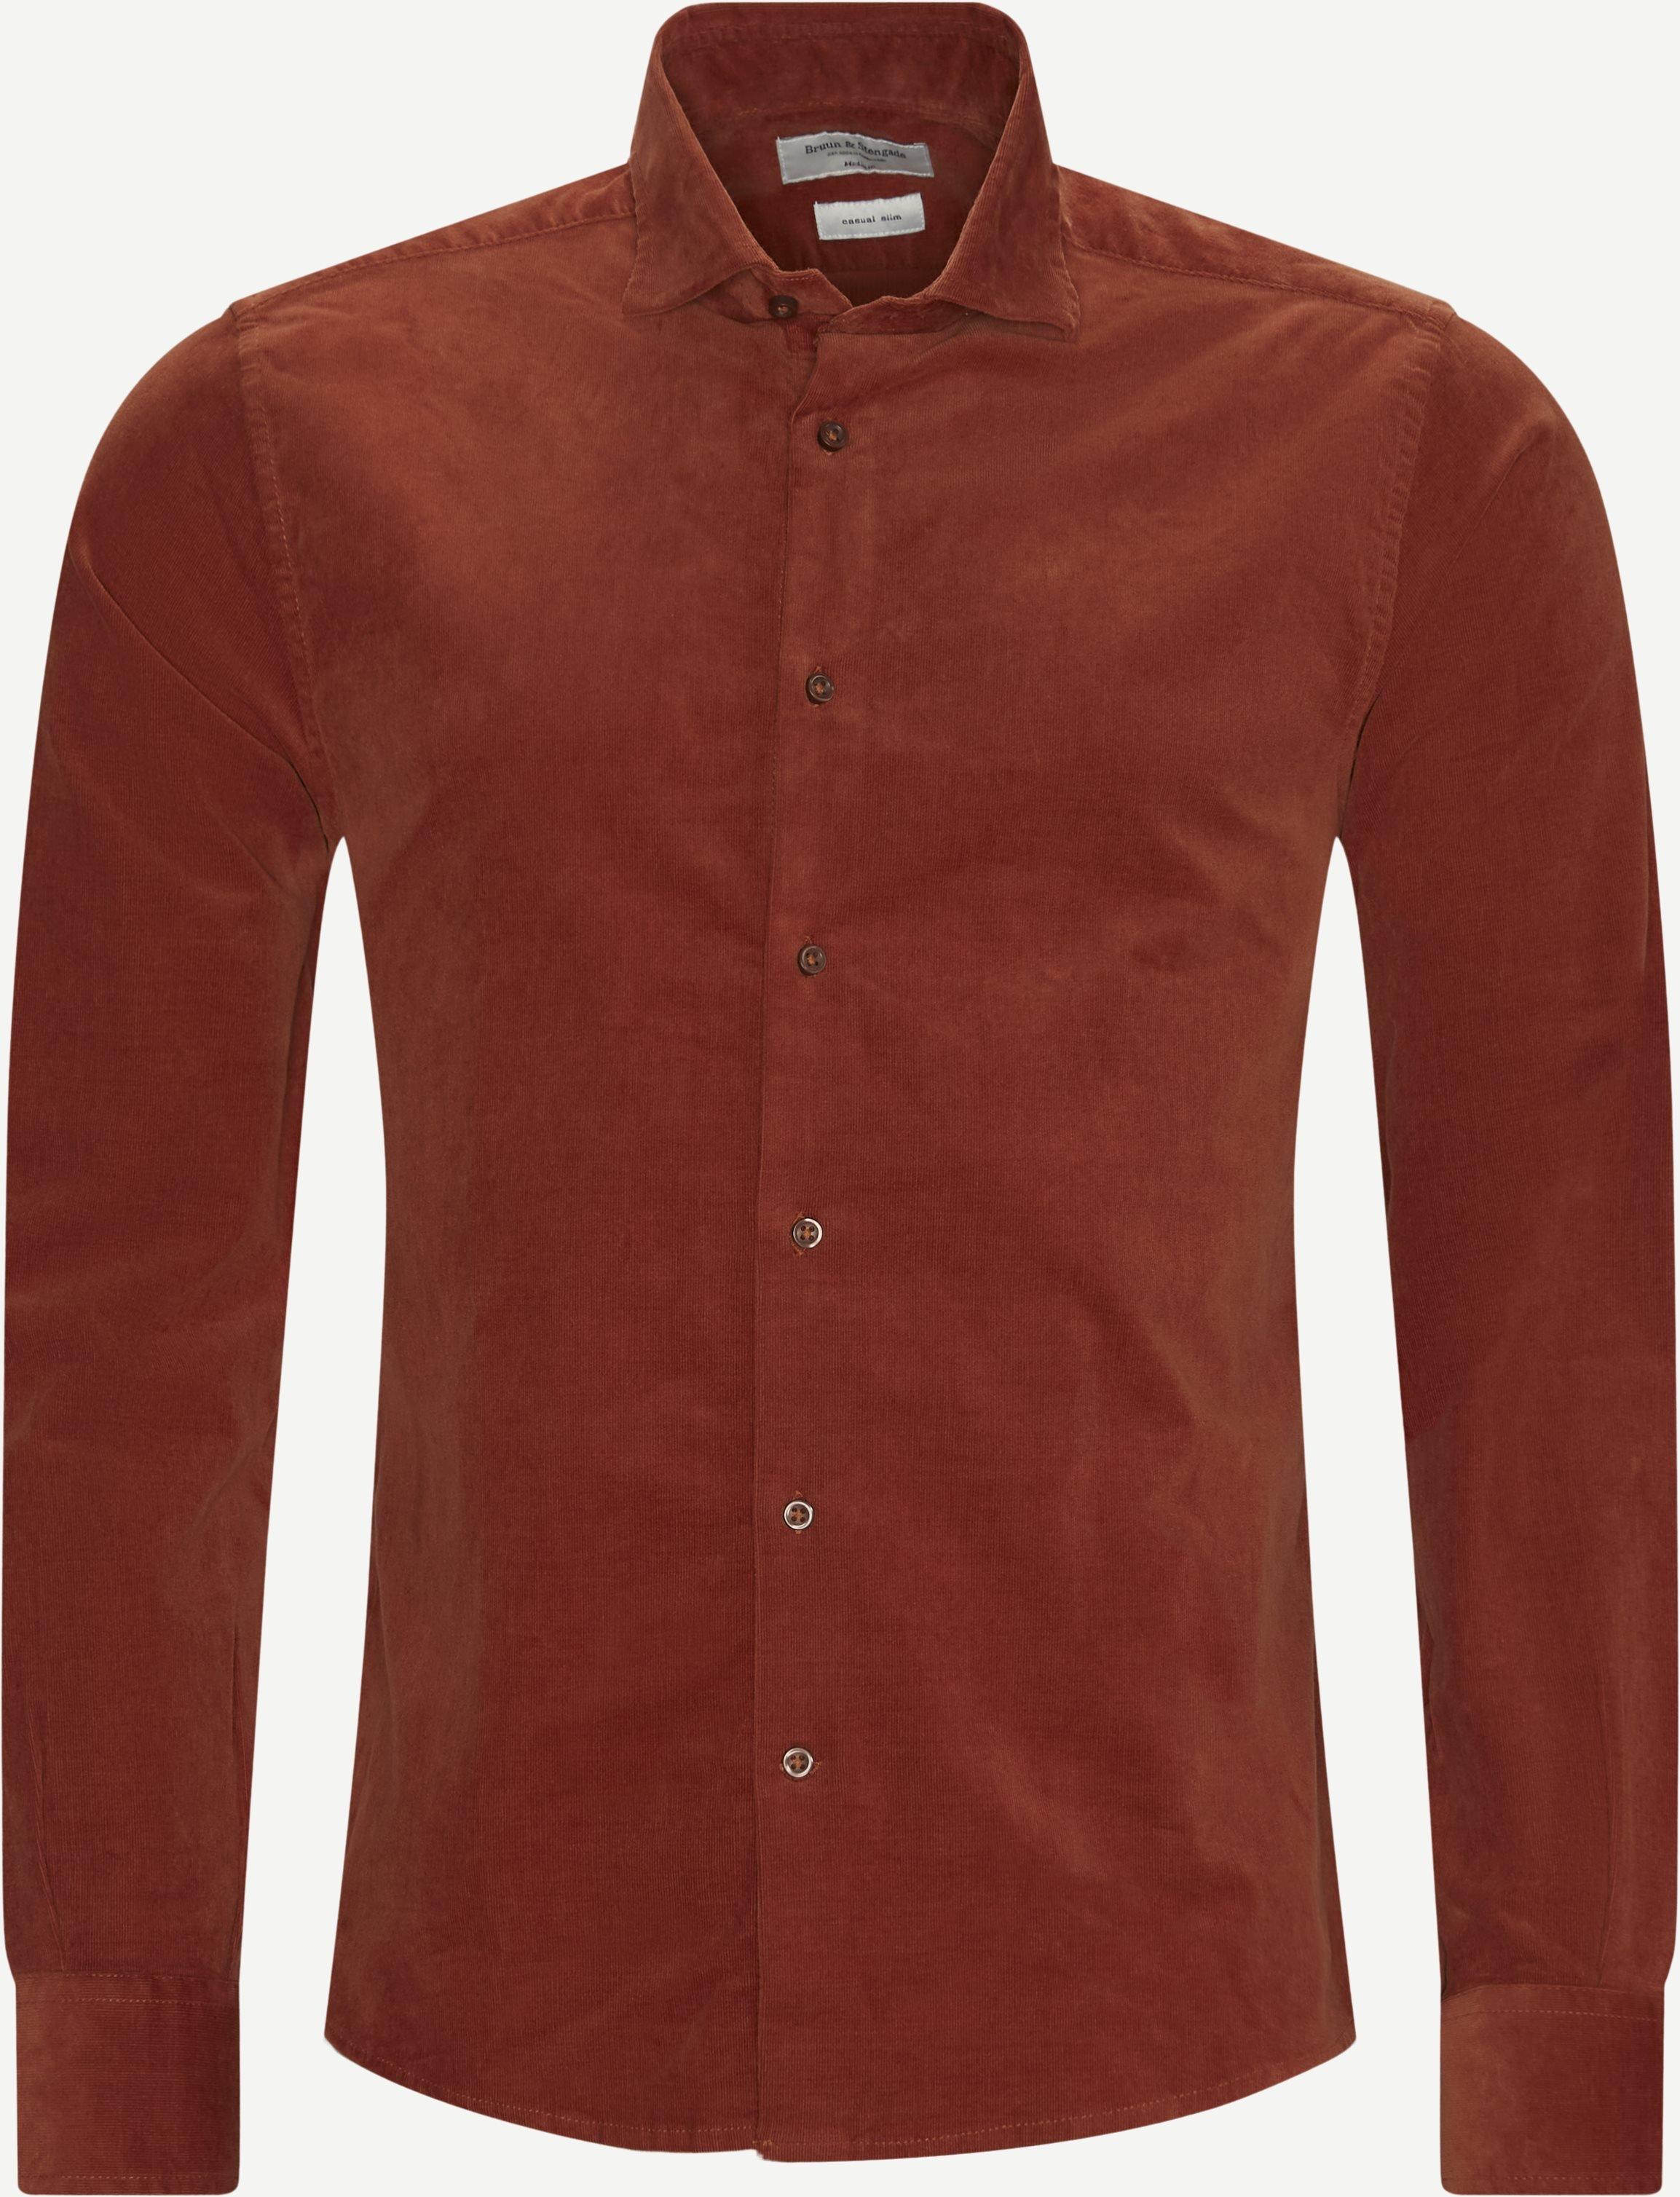 Hemden - Regular slim fit - Orange